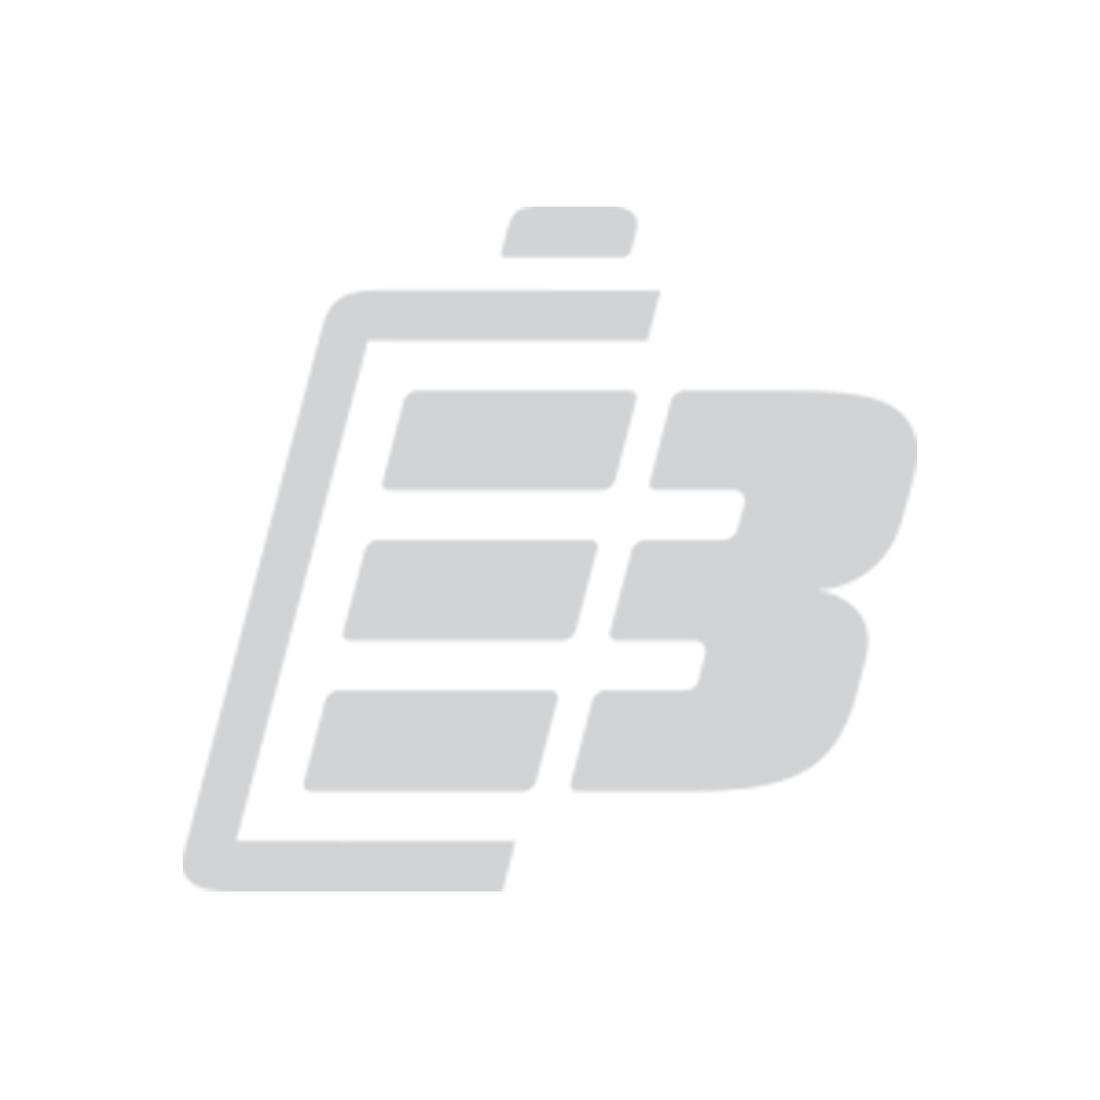 Two-Way radio battery Yaesu / Vertex VX-450_1